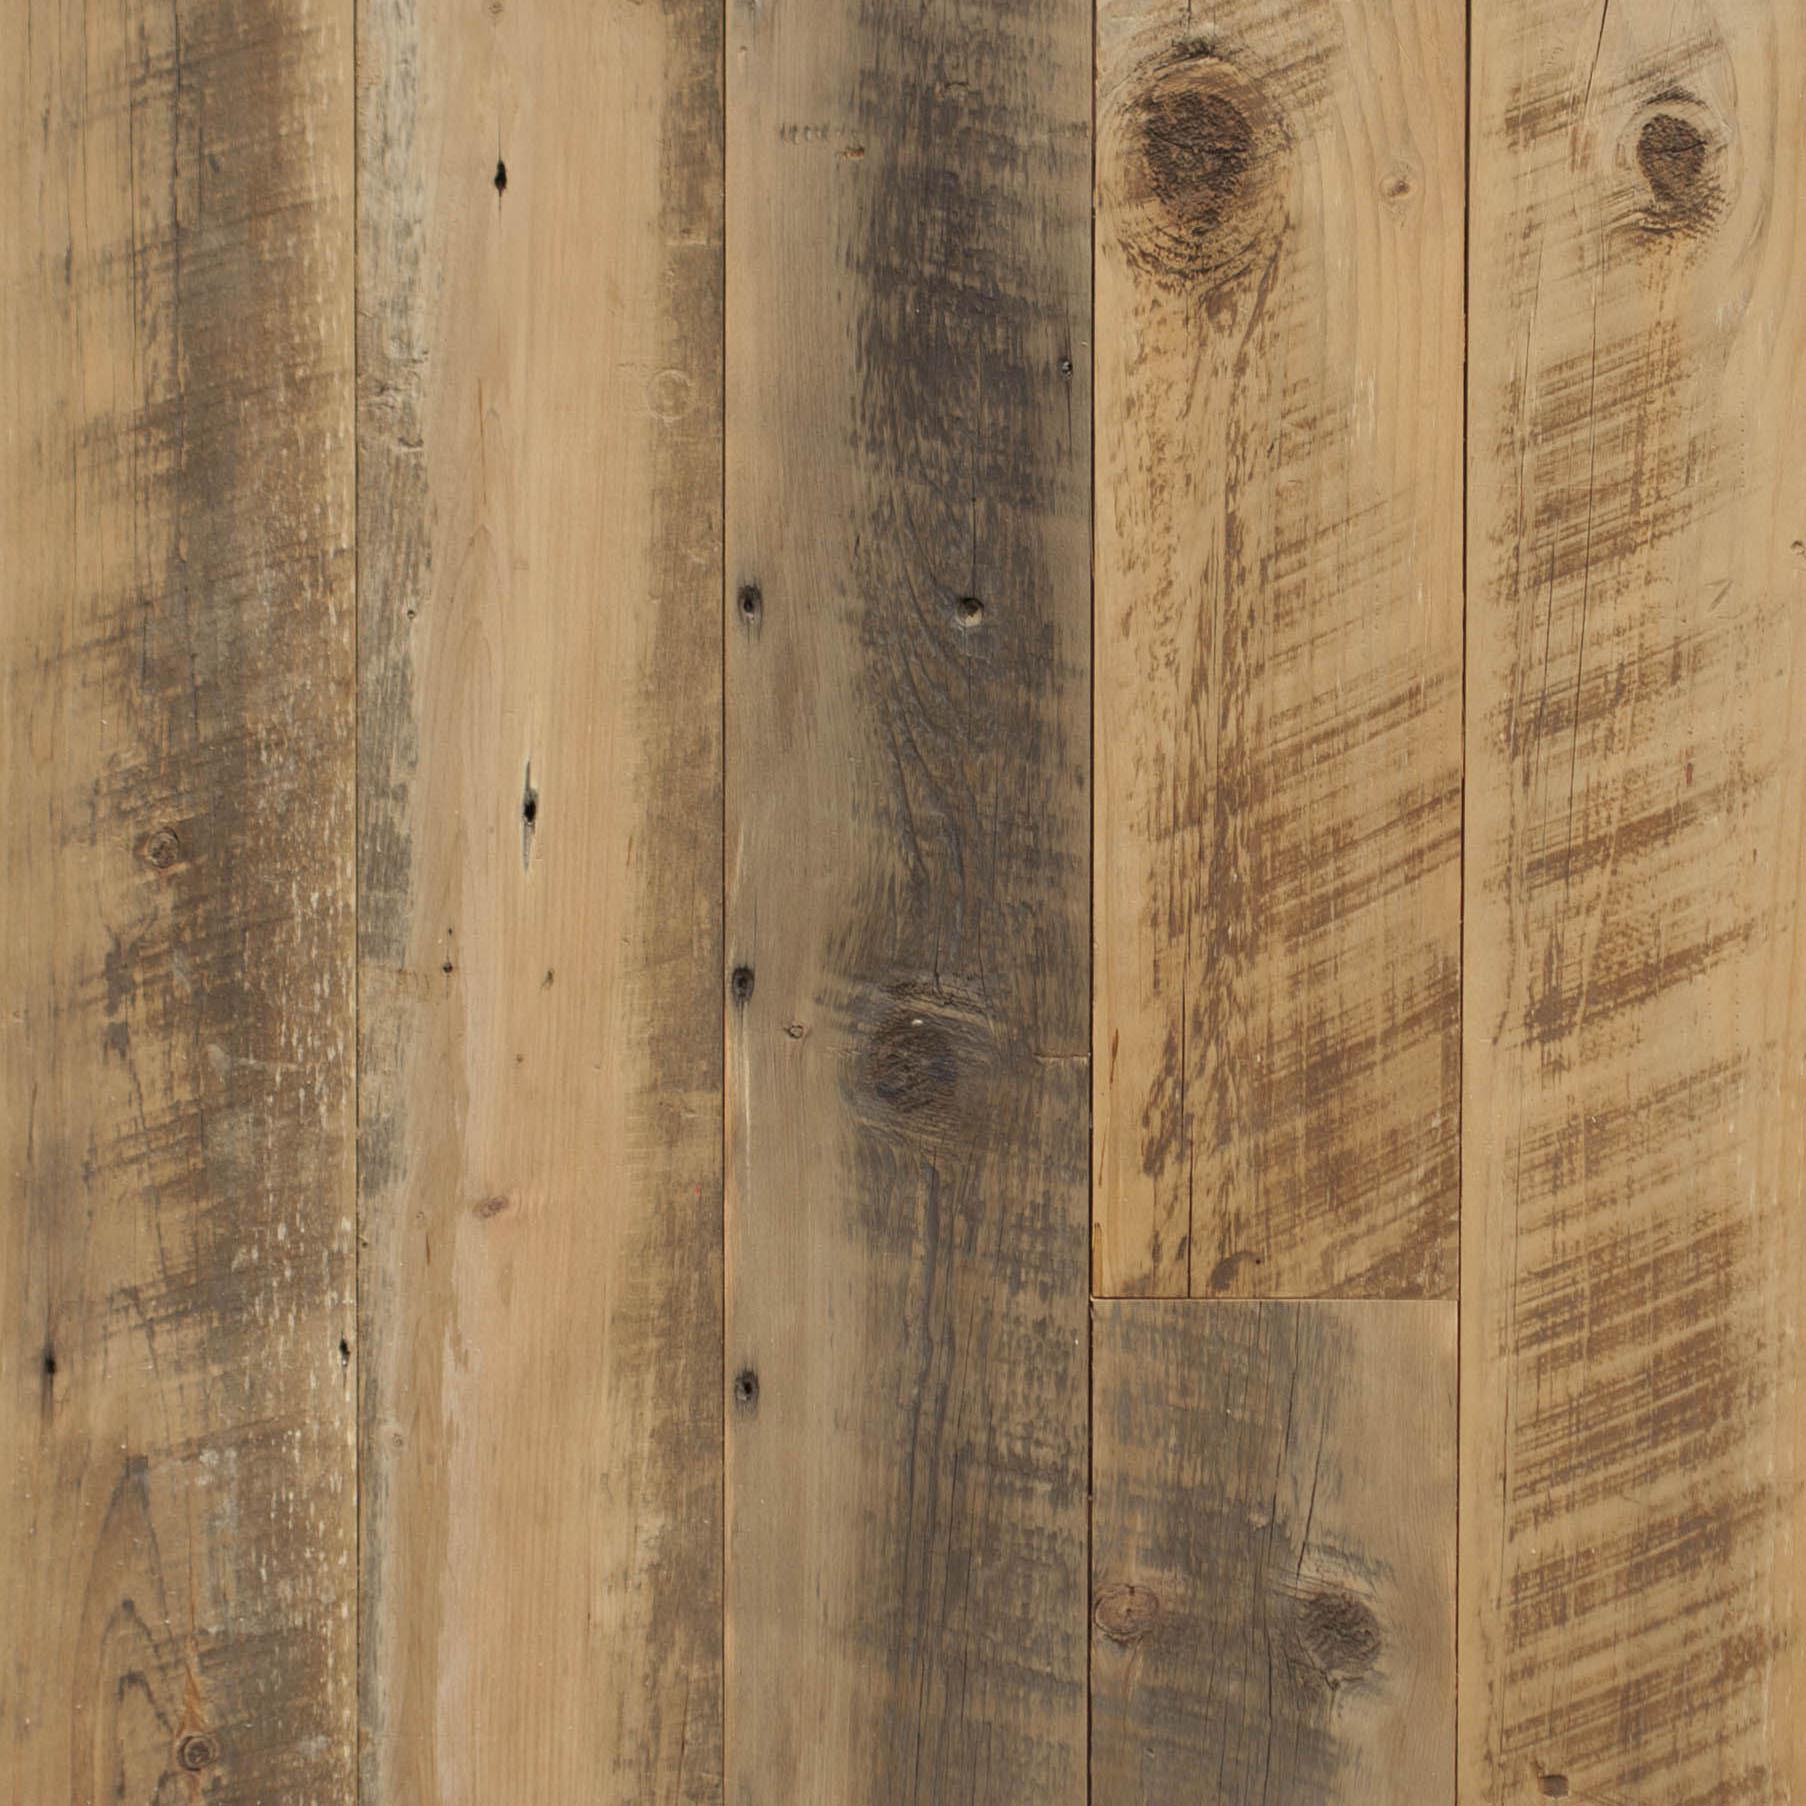 Longleaf Lumber Skip Planed Reclaimed Softwoods Paneling